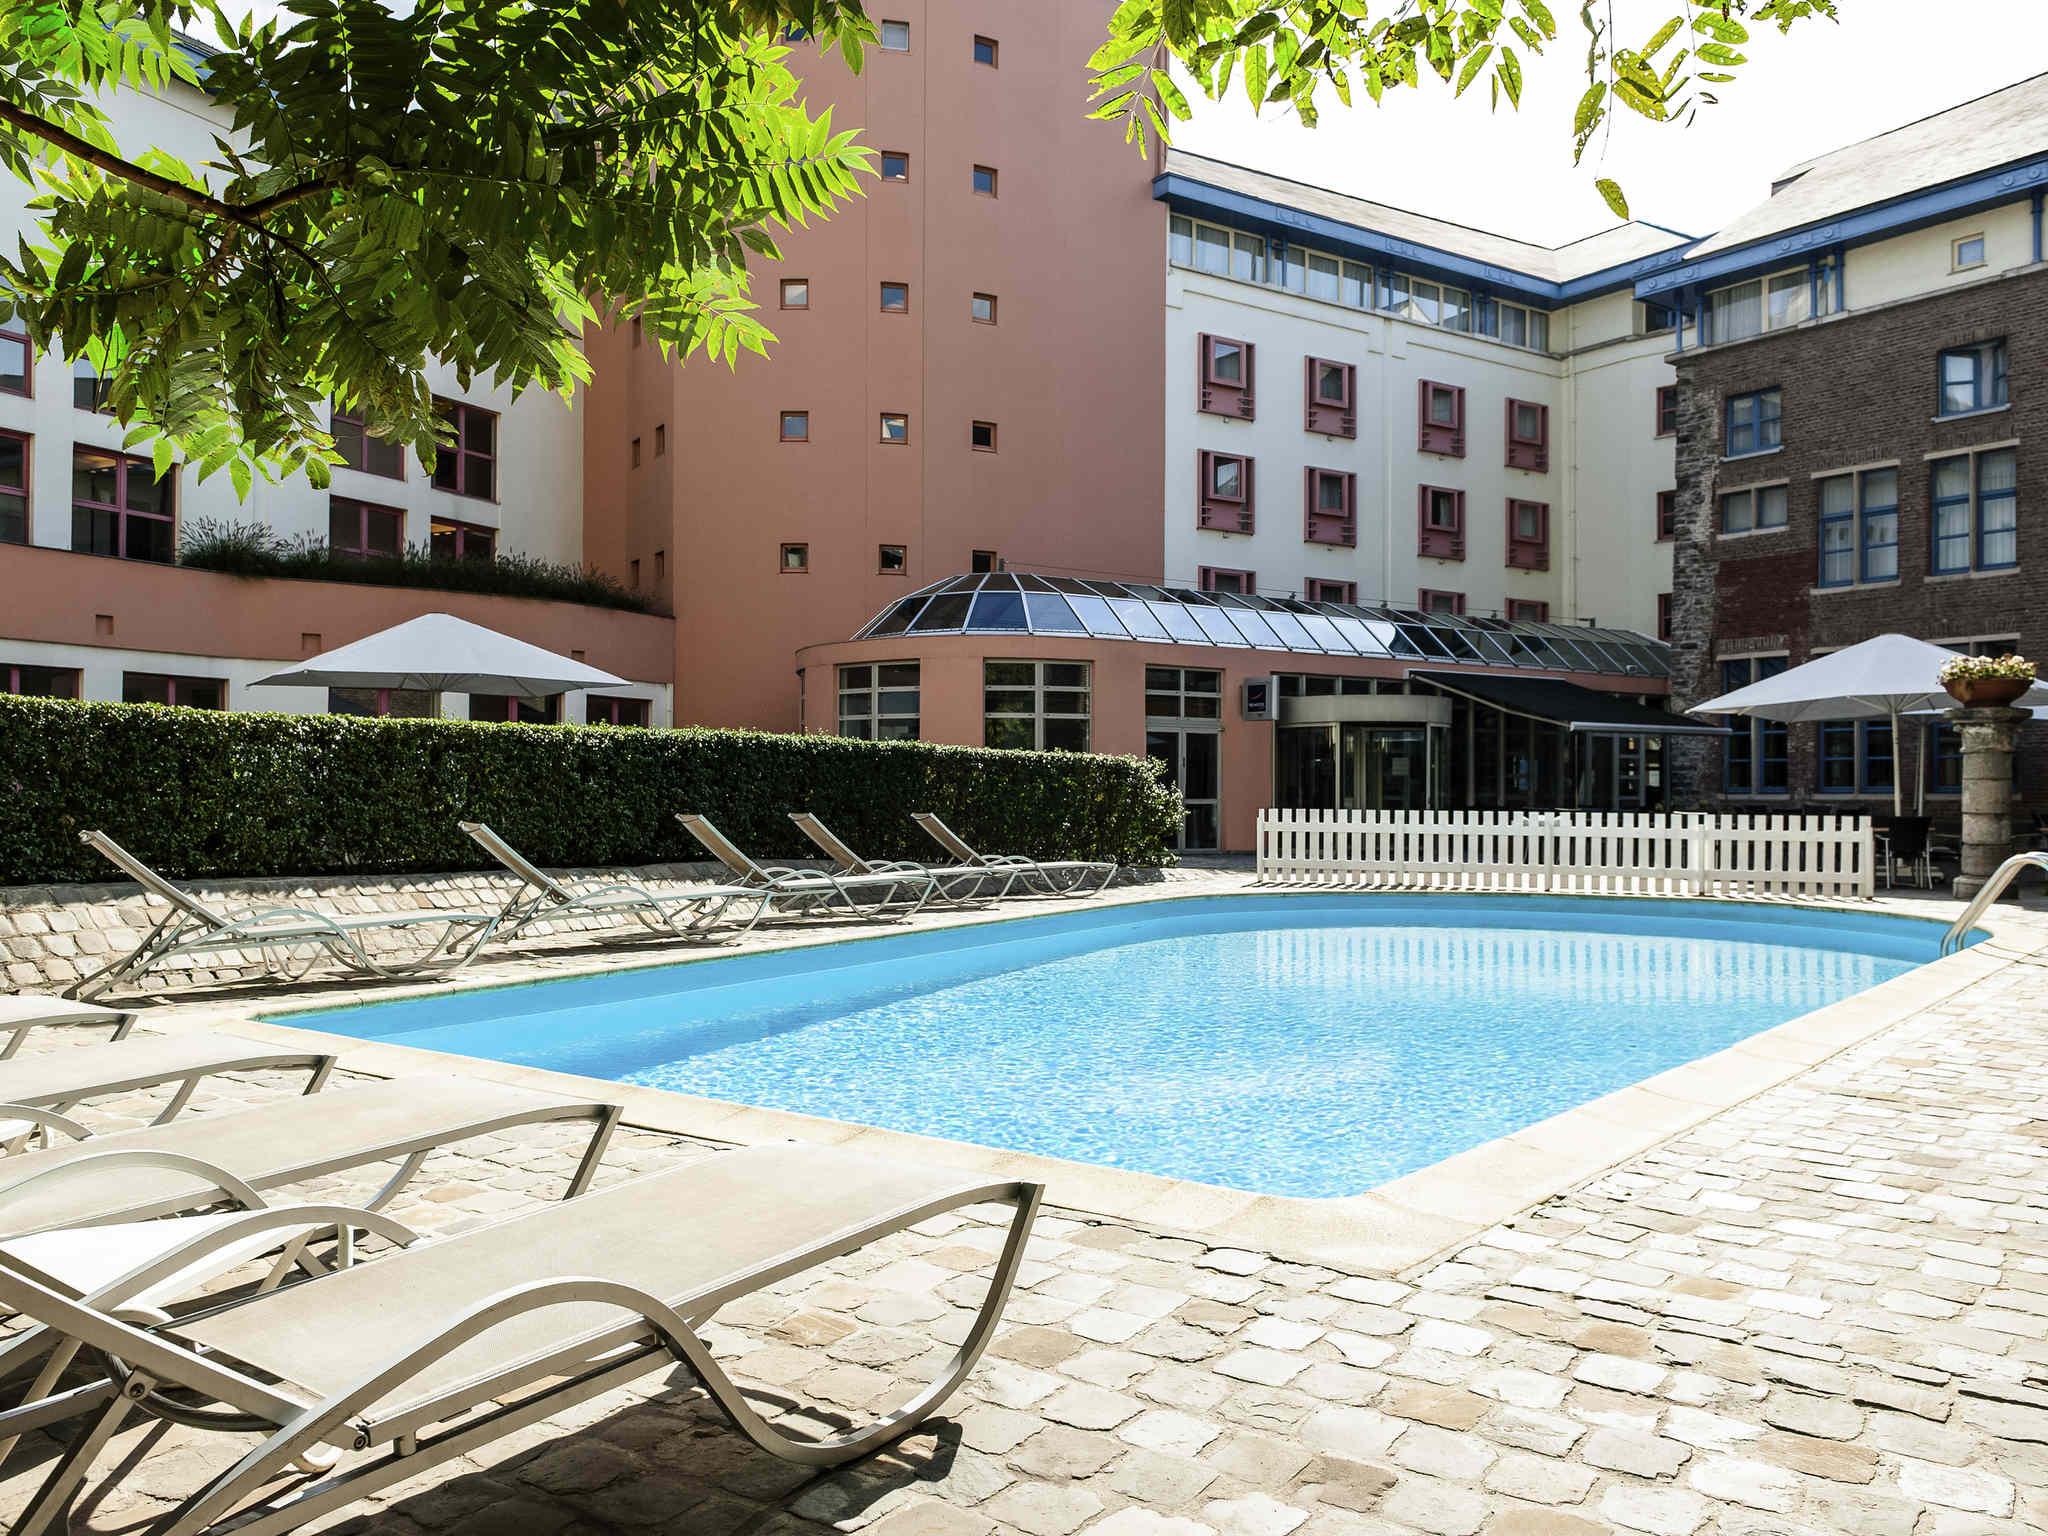 Hotel – Novotel Gent Centrum